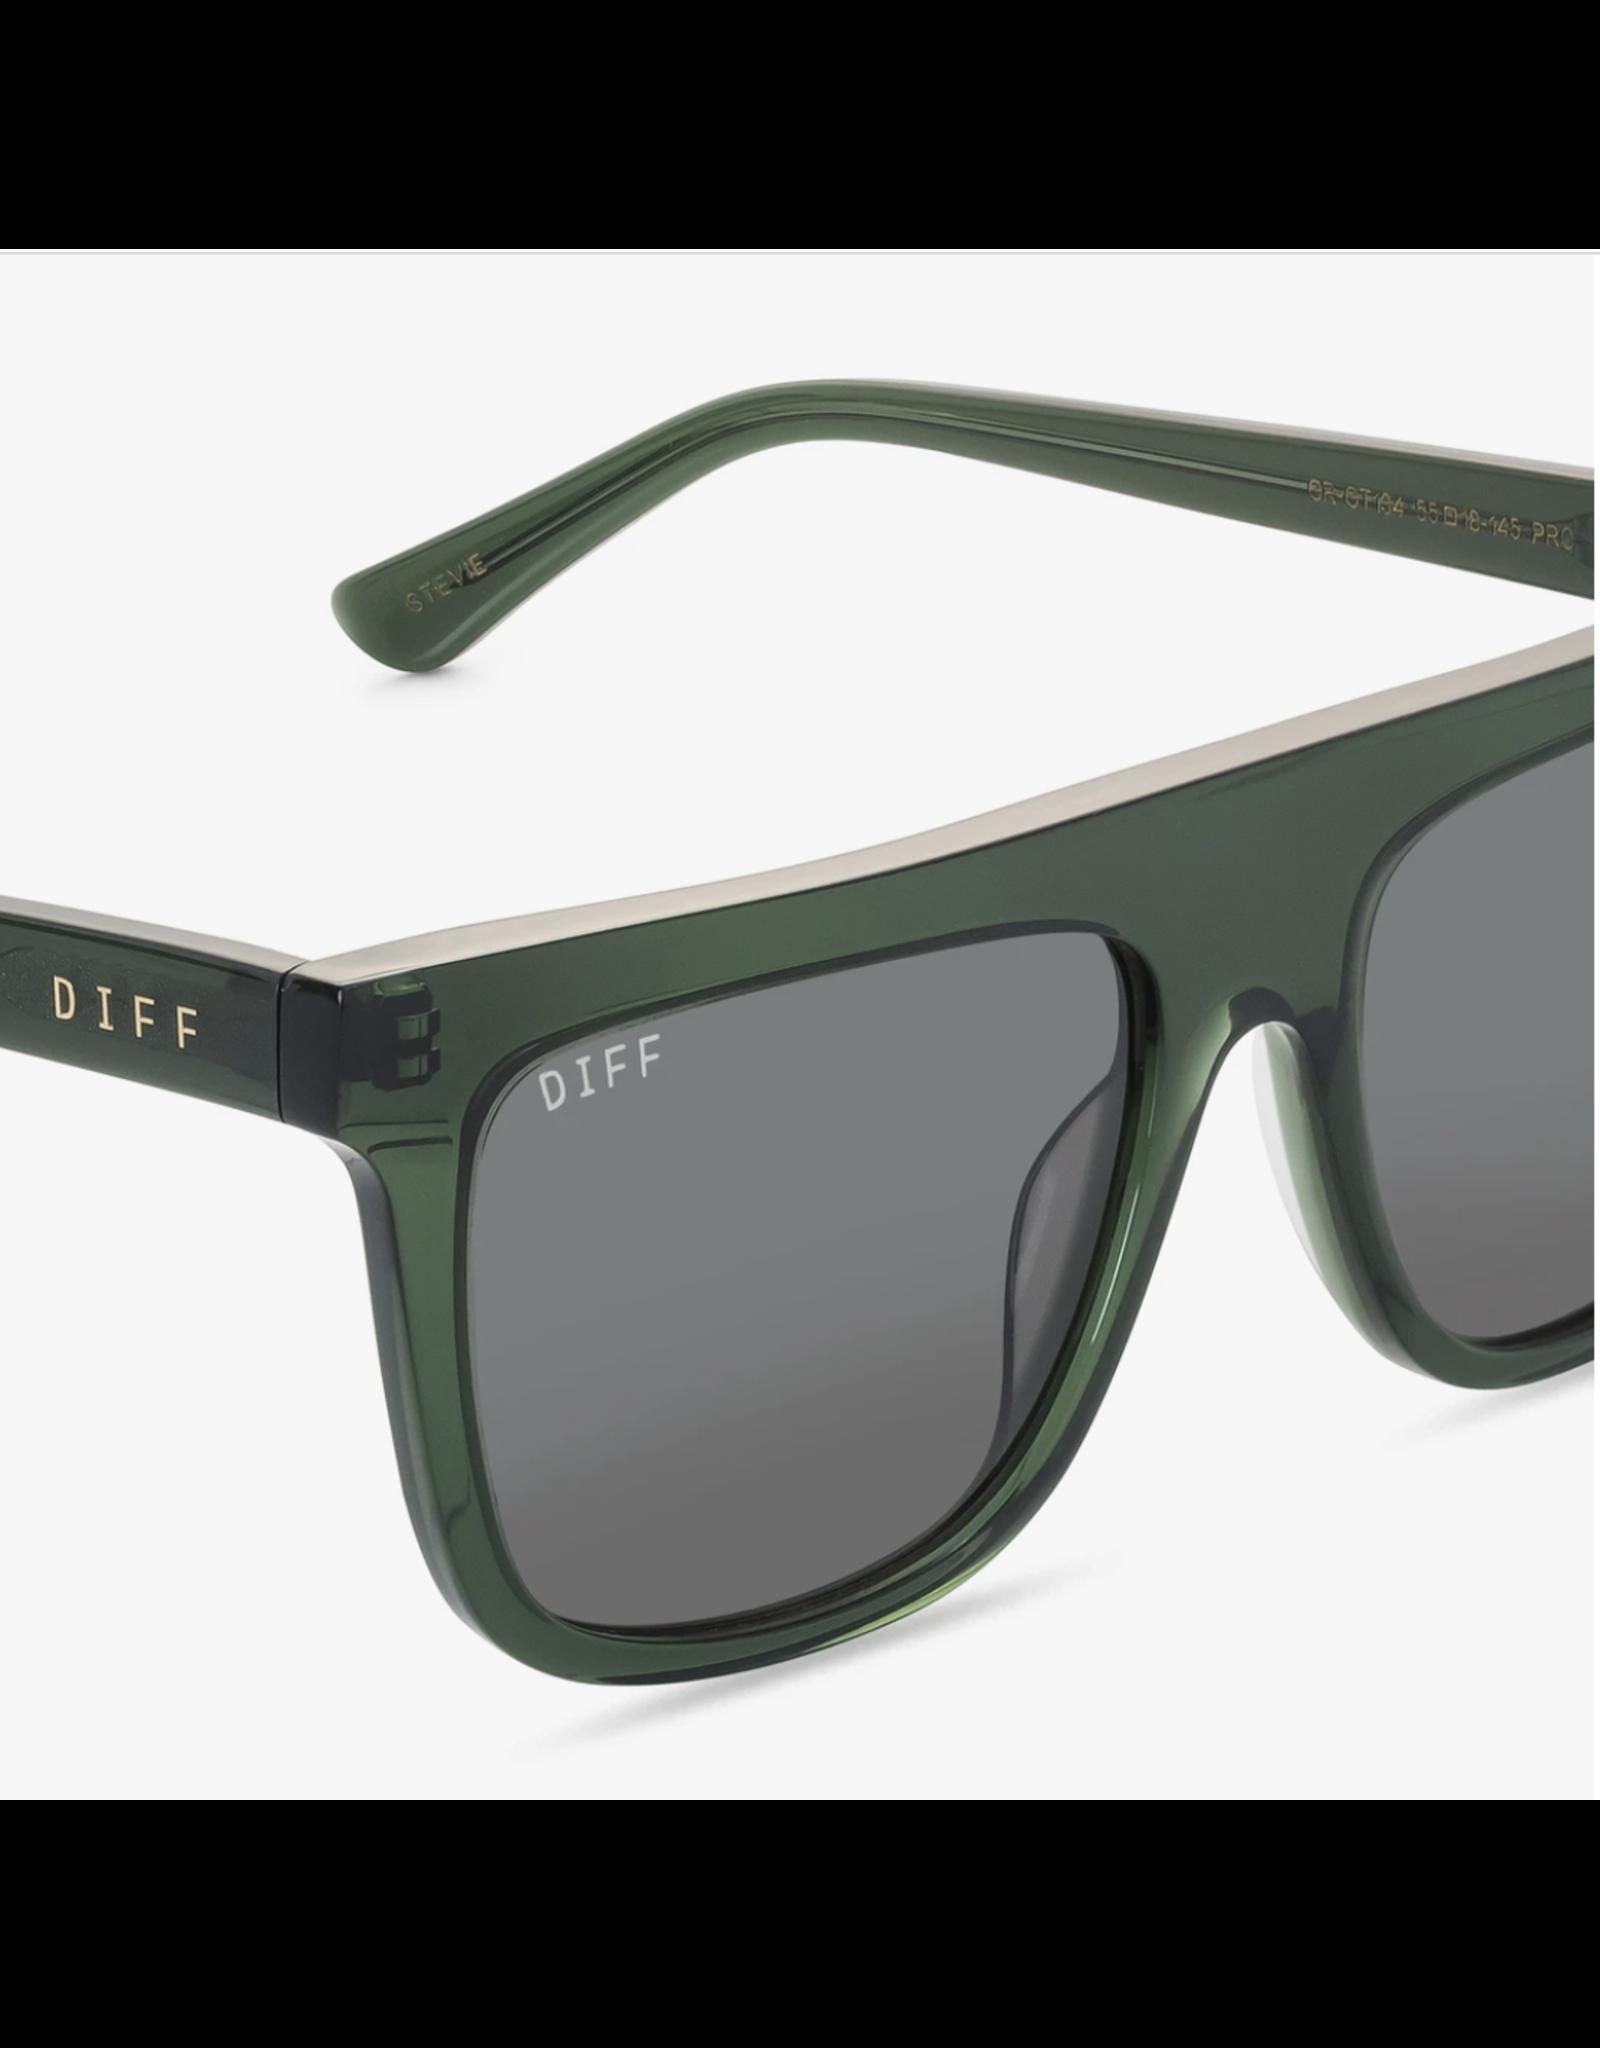 Diff Eyewear Stevie